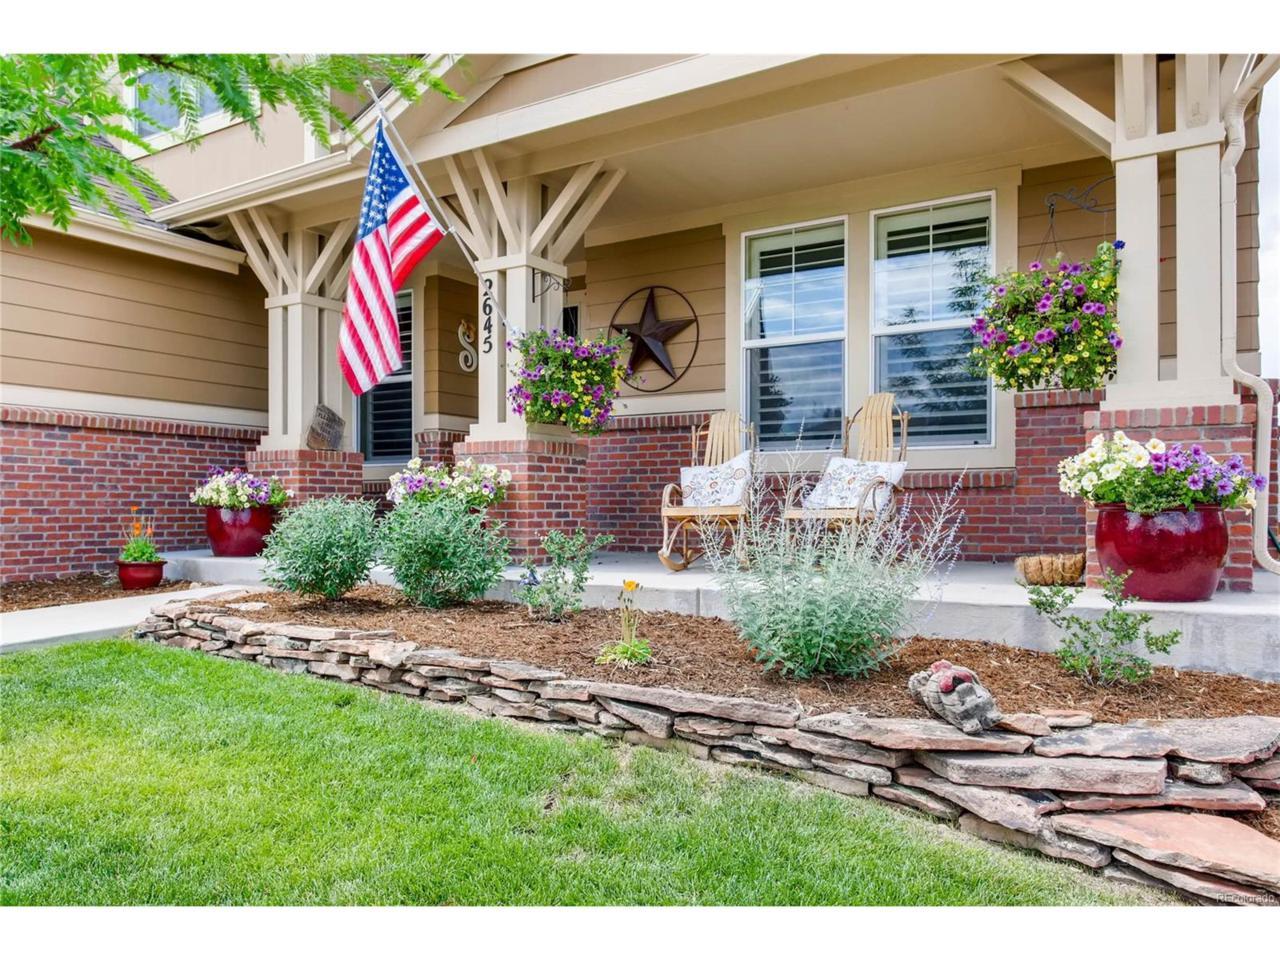 2645 Mclean Court, Castle Rock, CO 80109 (MLS #6952614) :: 8z Real Estate